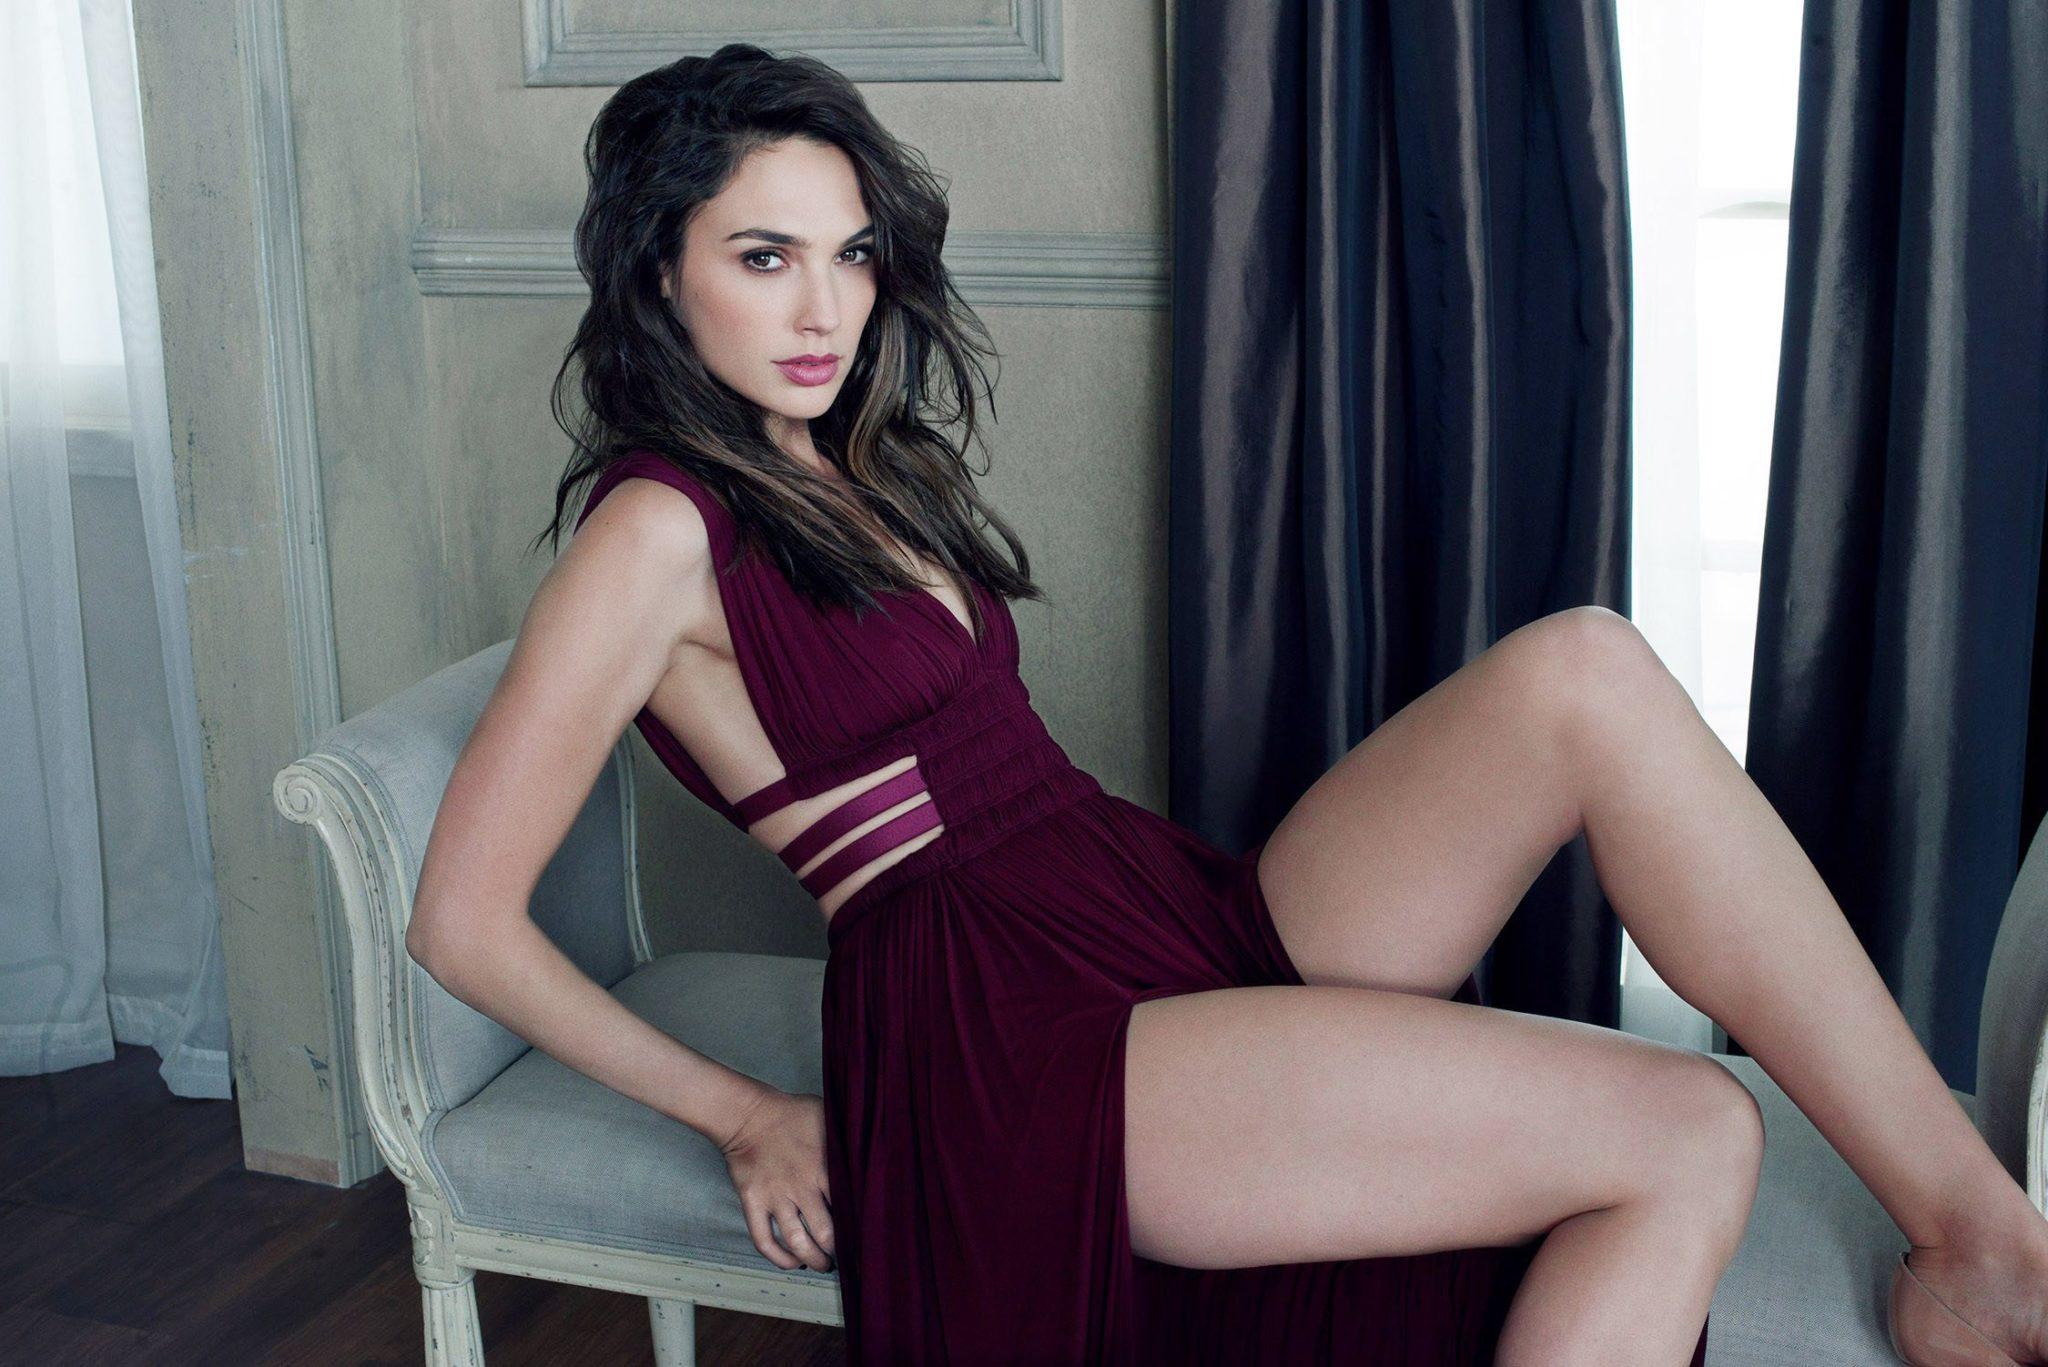 Hot Gal Gadot Showing Legs Wallpapers 2048x1367